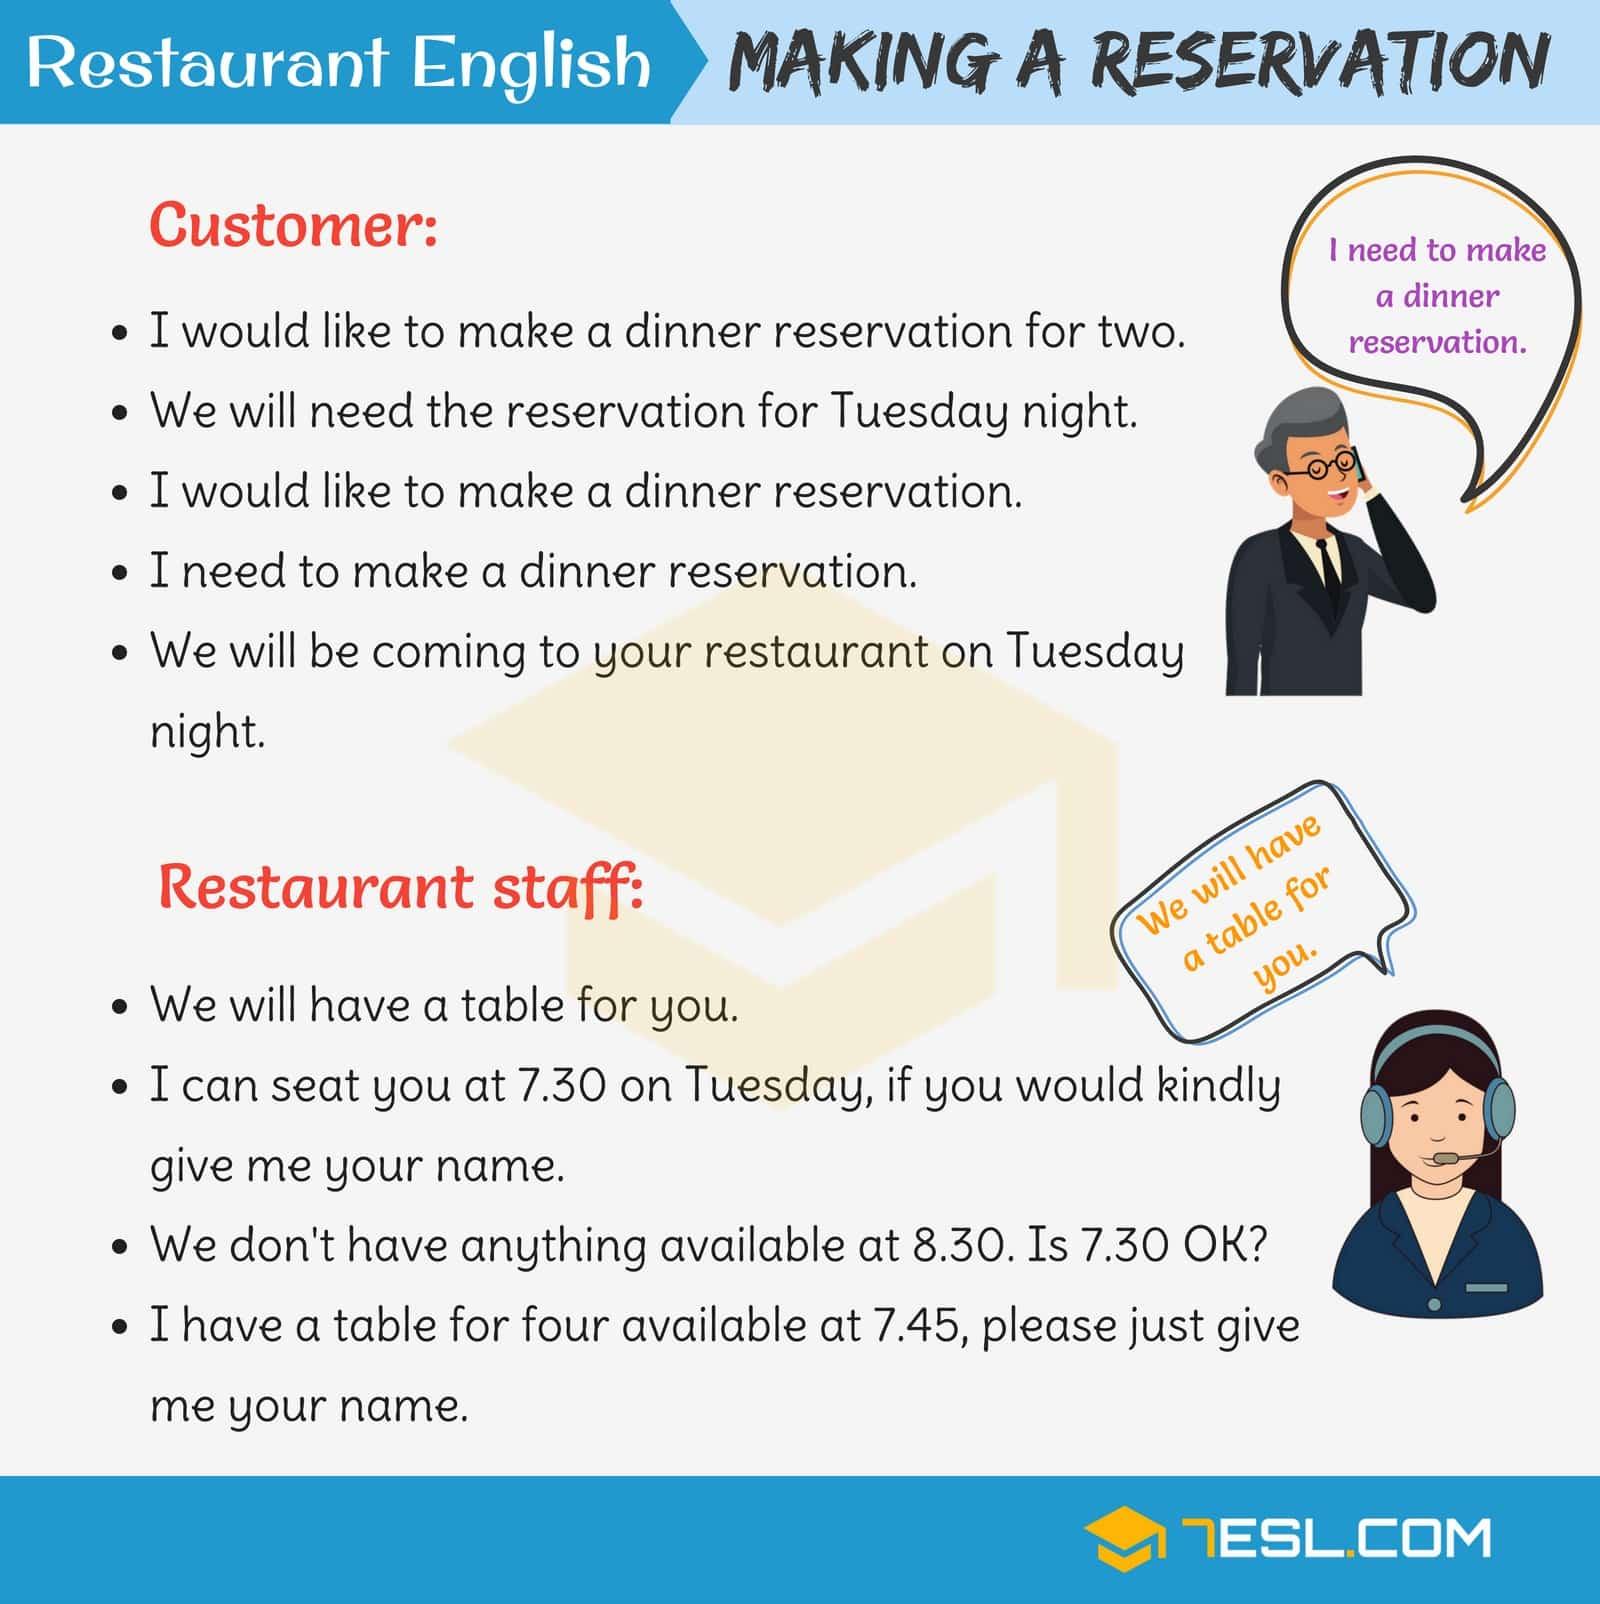 Making A Reservation At A Restaurant Dialogue